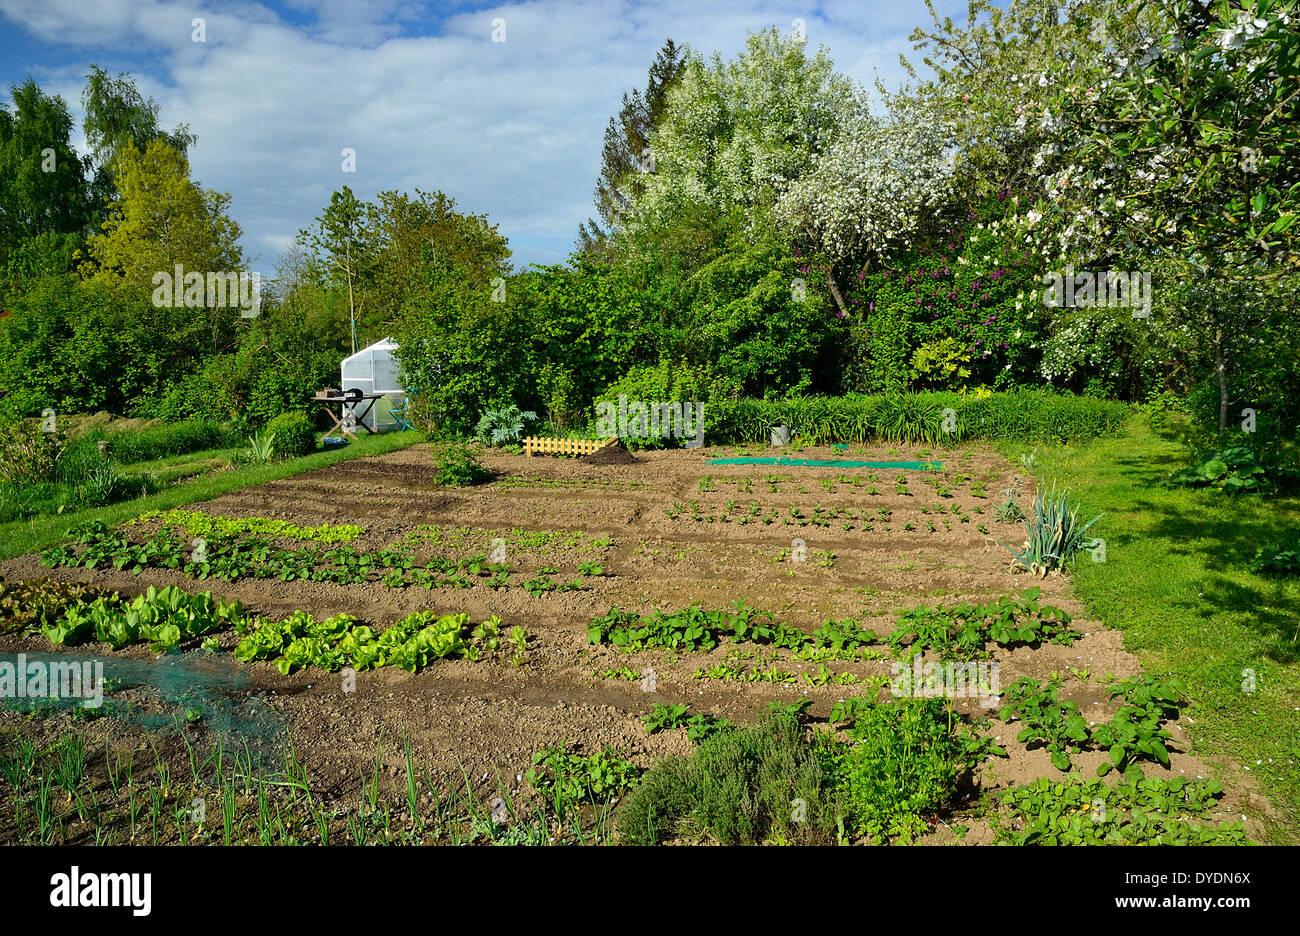 Vegetable garden in spring vegetable beds small for Fruit and vegetable garden